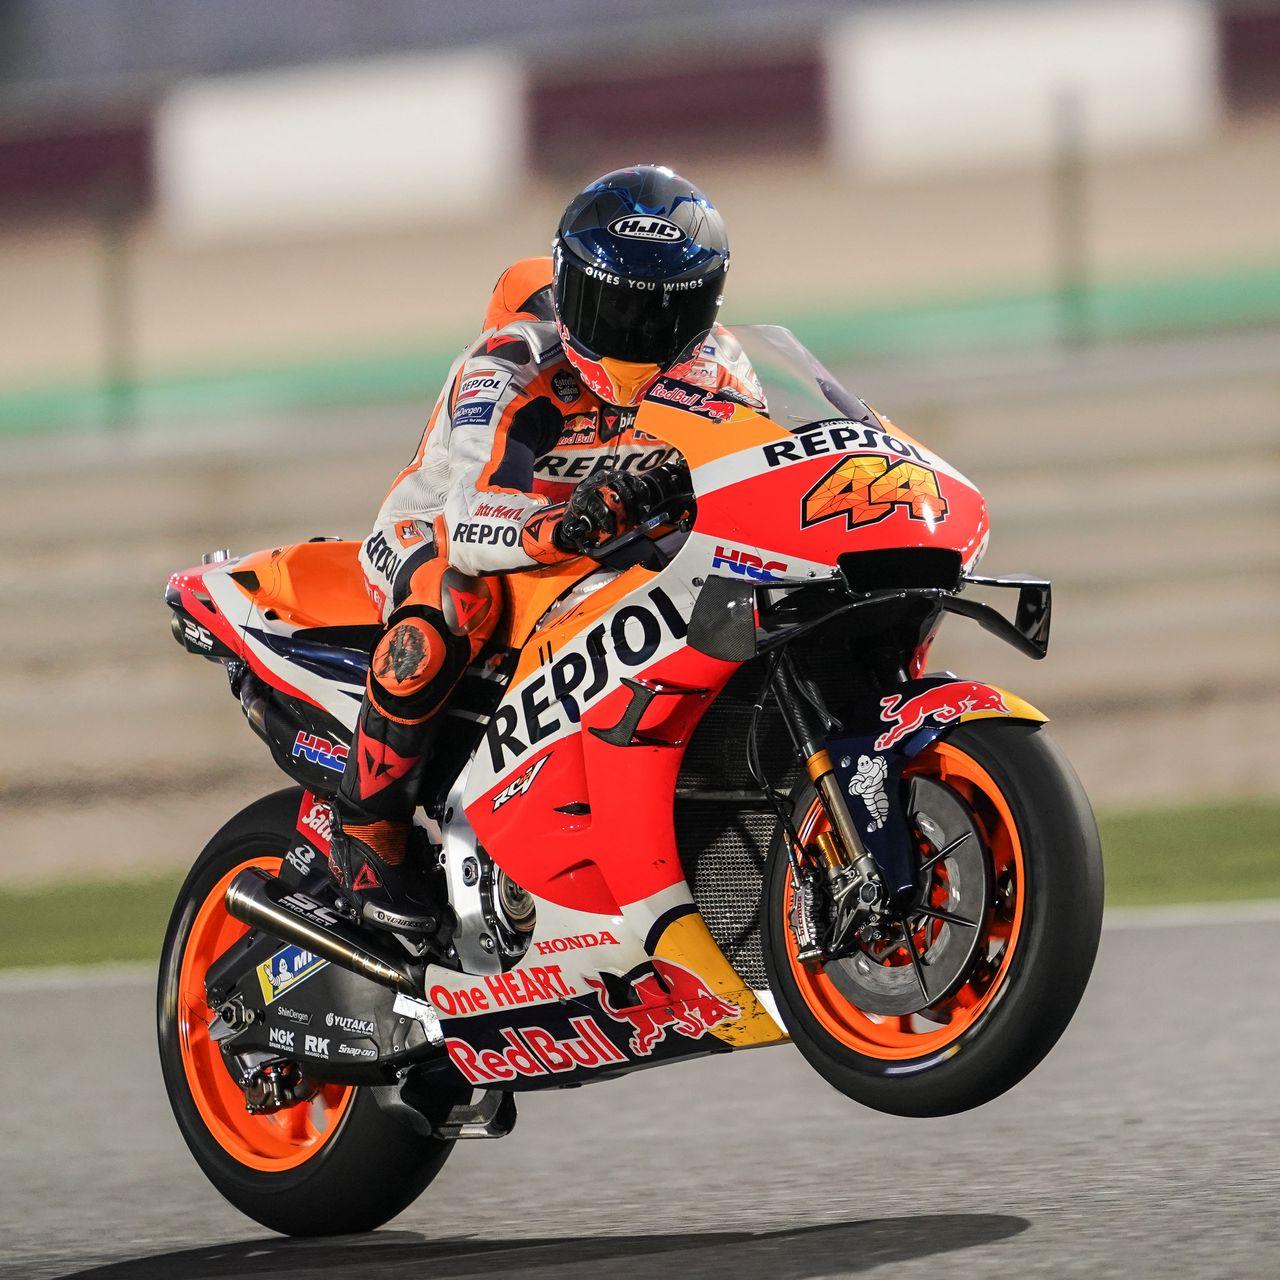 1280x1280 Wallpaper honda, motorcycle, motorcyclist, helmet, speed, track, orange